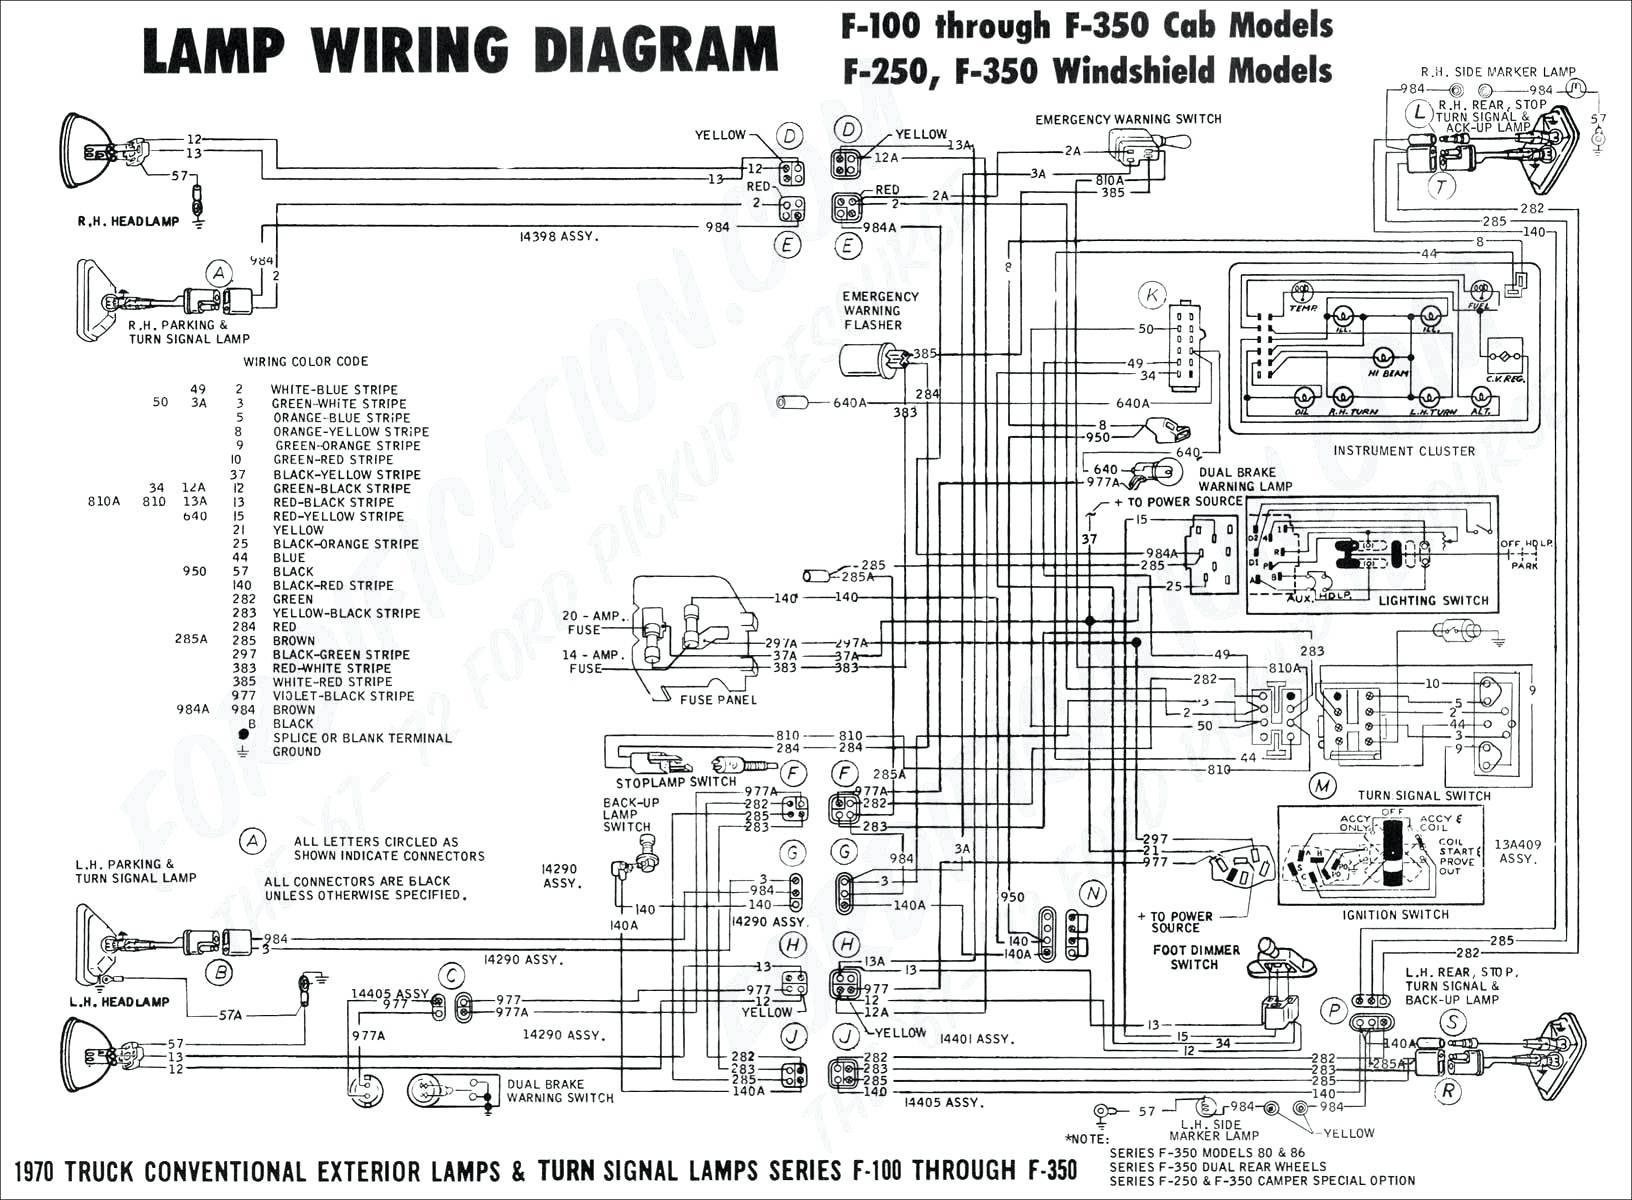 Hoffberg Alternator Wiring Diagram - Wiring Diagram Schema - 3 Wire Alternator Wiring Diagram